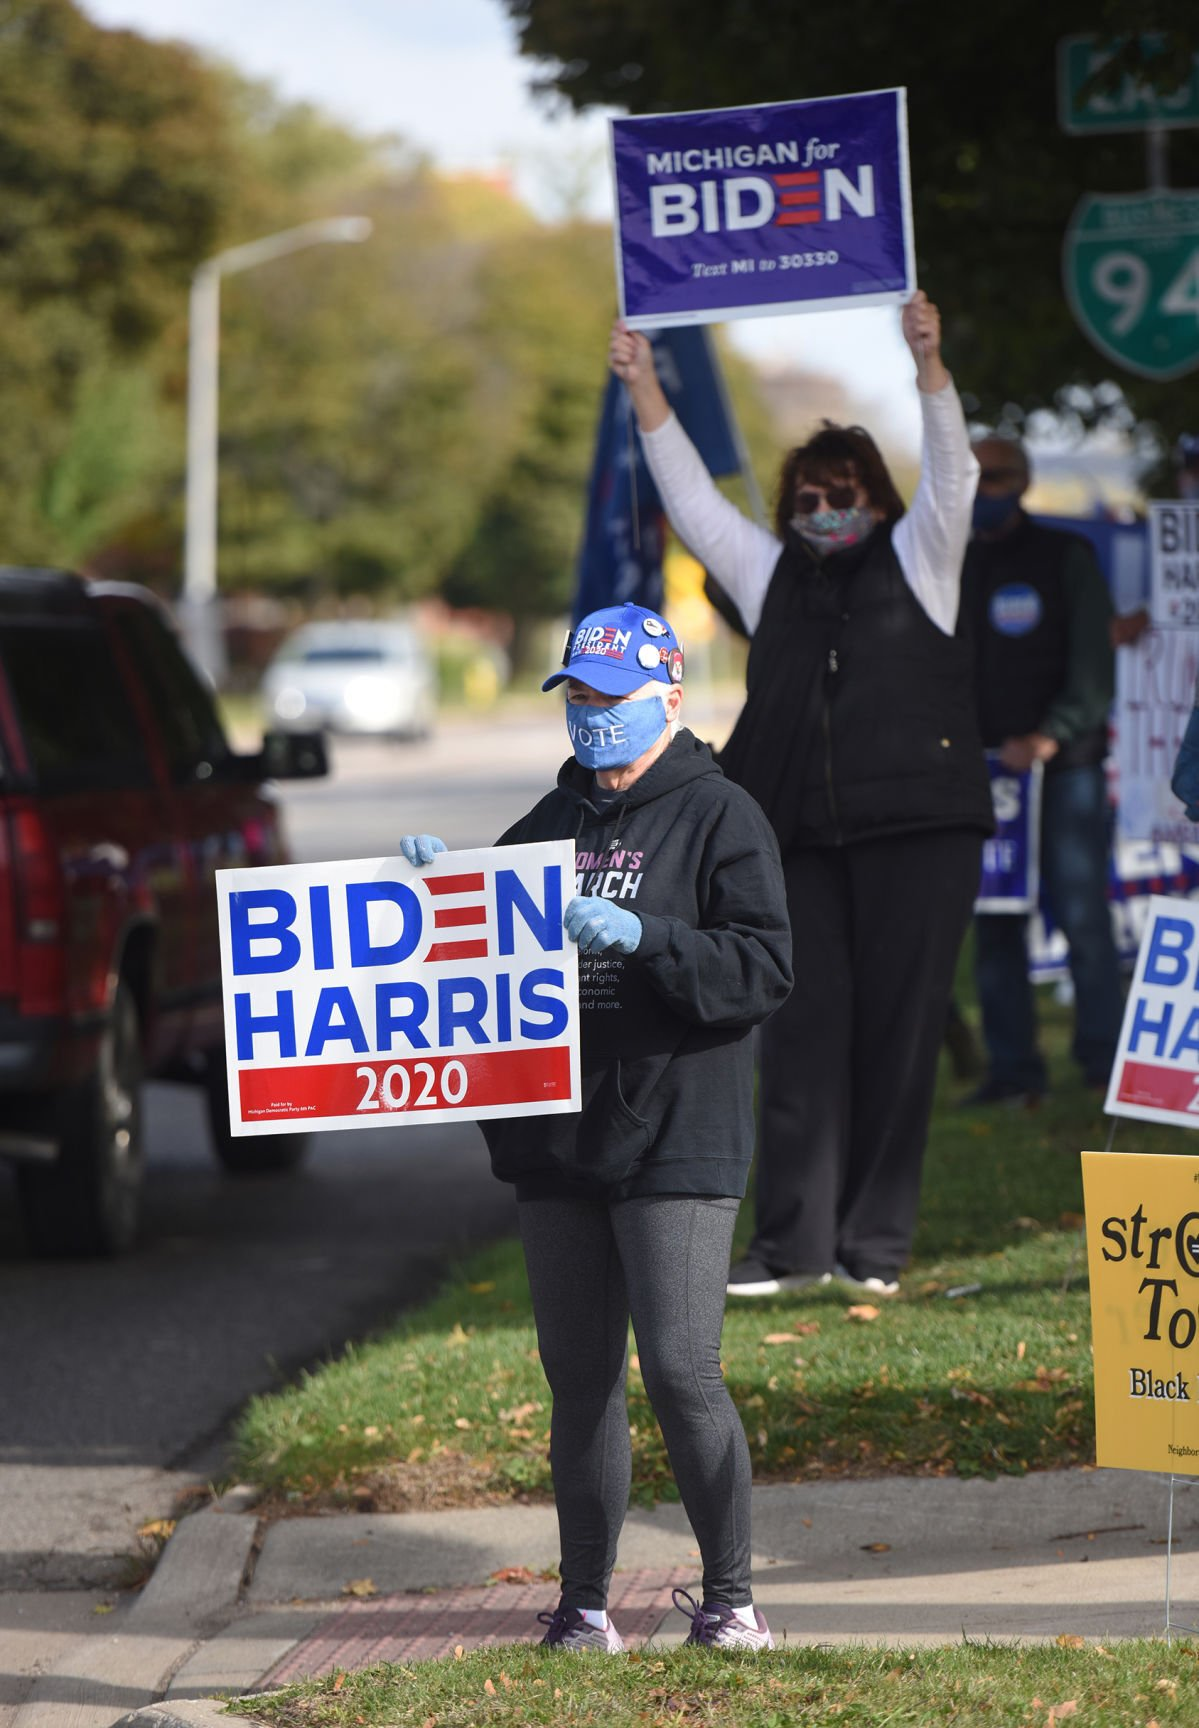 201031-HP-election-rally2-photo.jpg